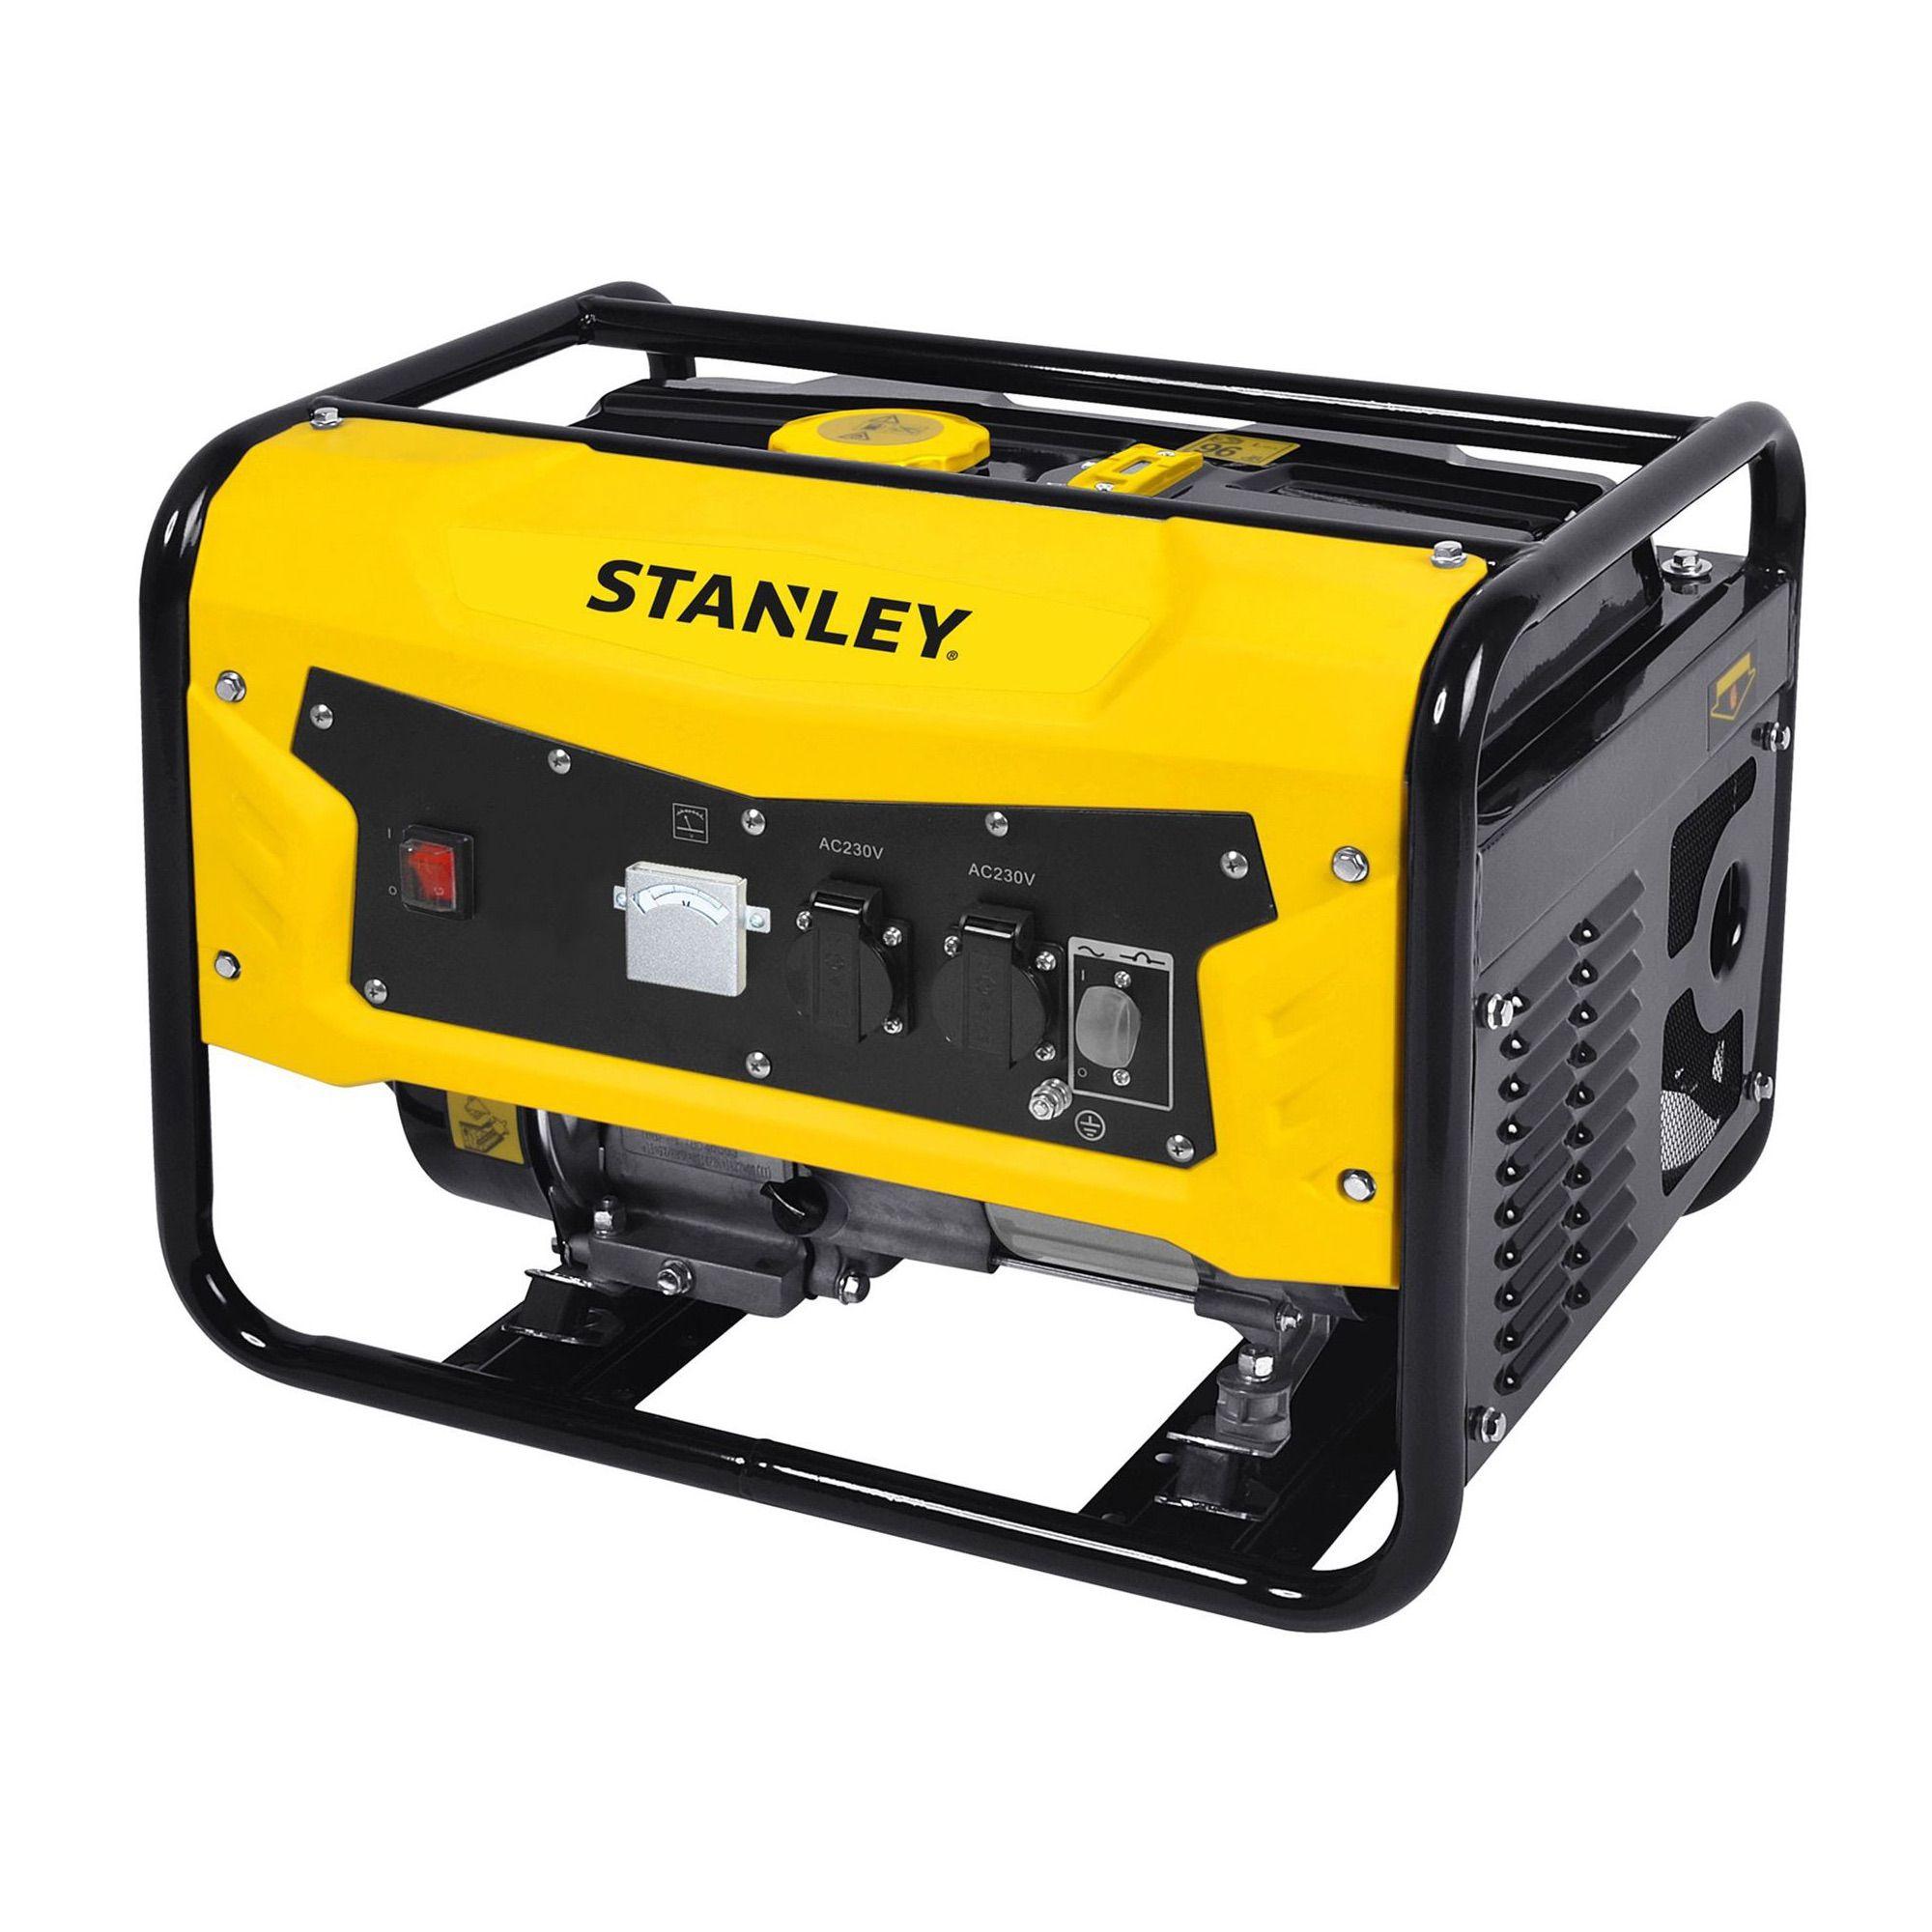 Generator 3.1 kW AVR 15 litri 2 x 220 V Stanley